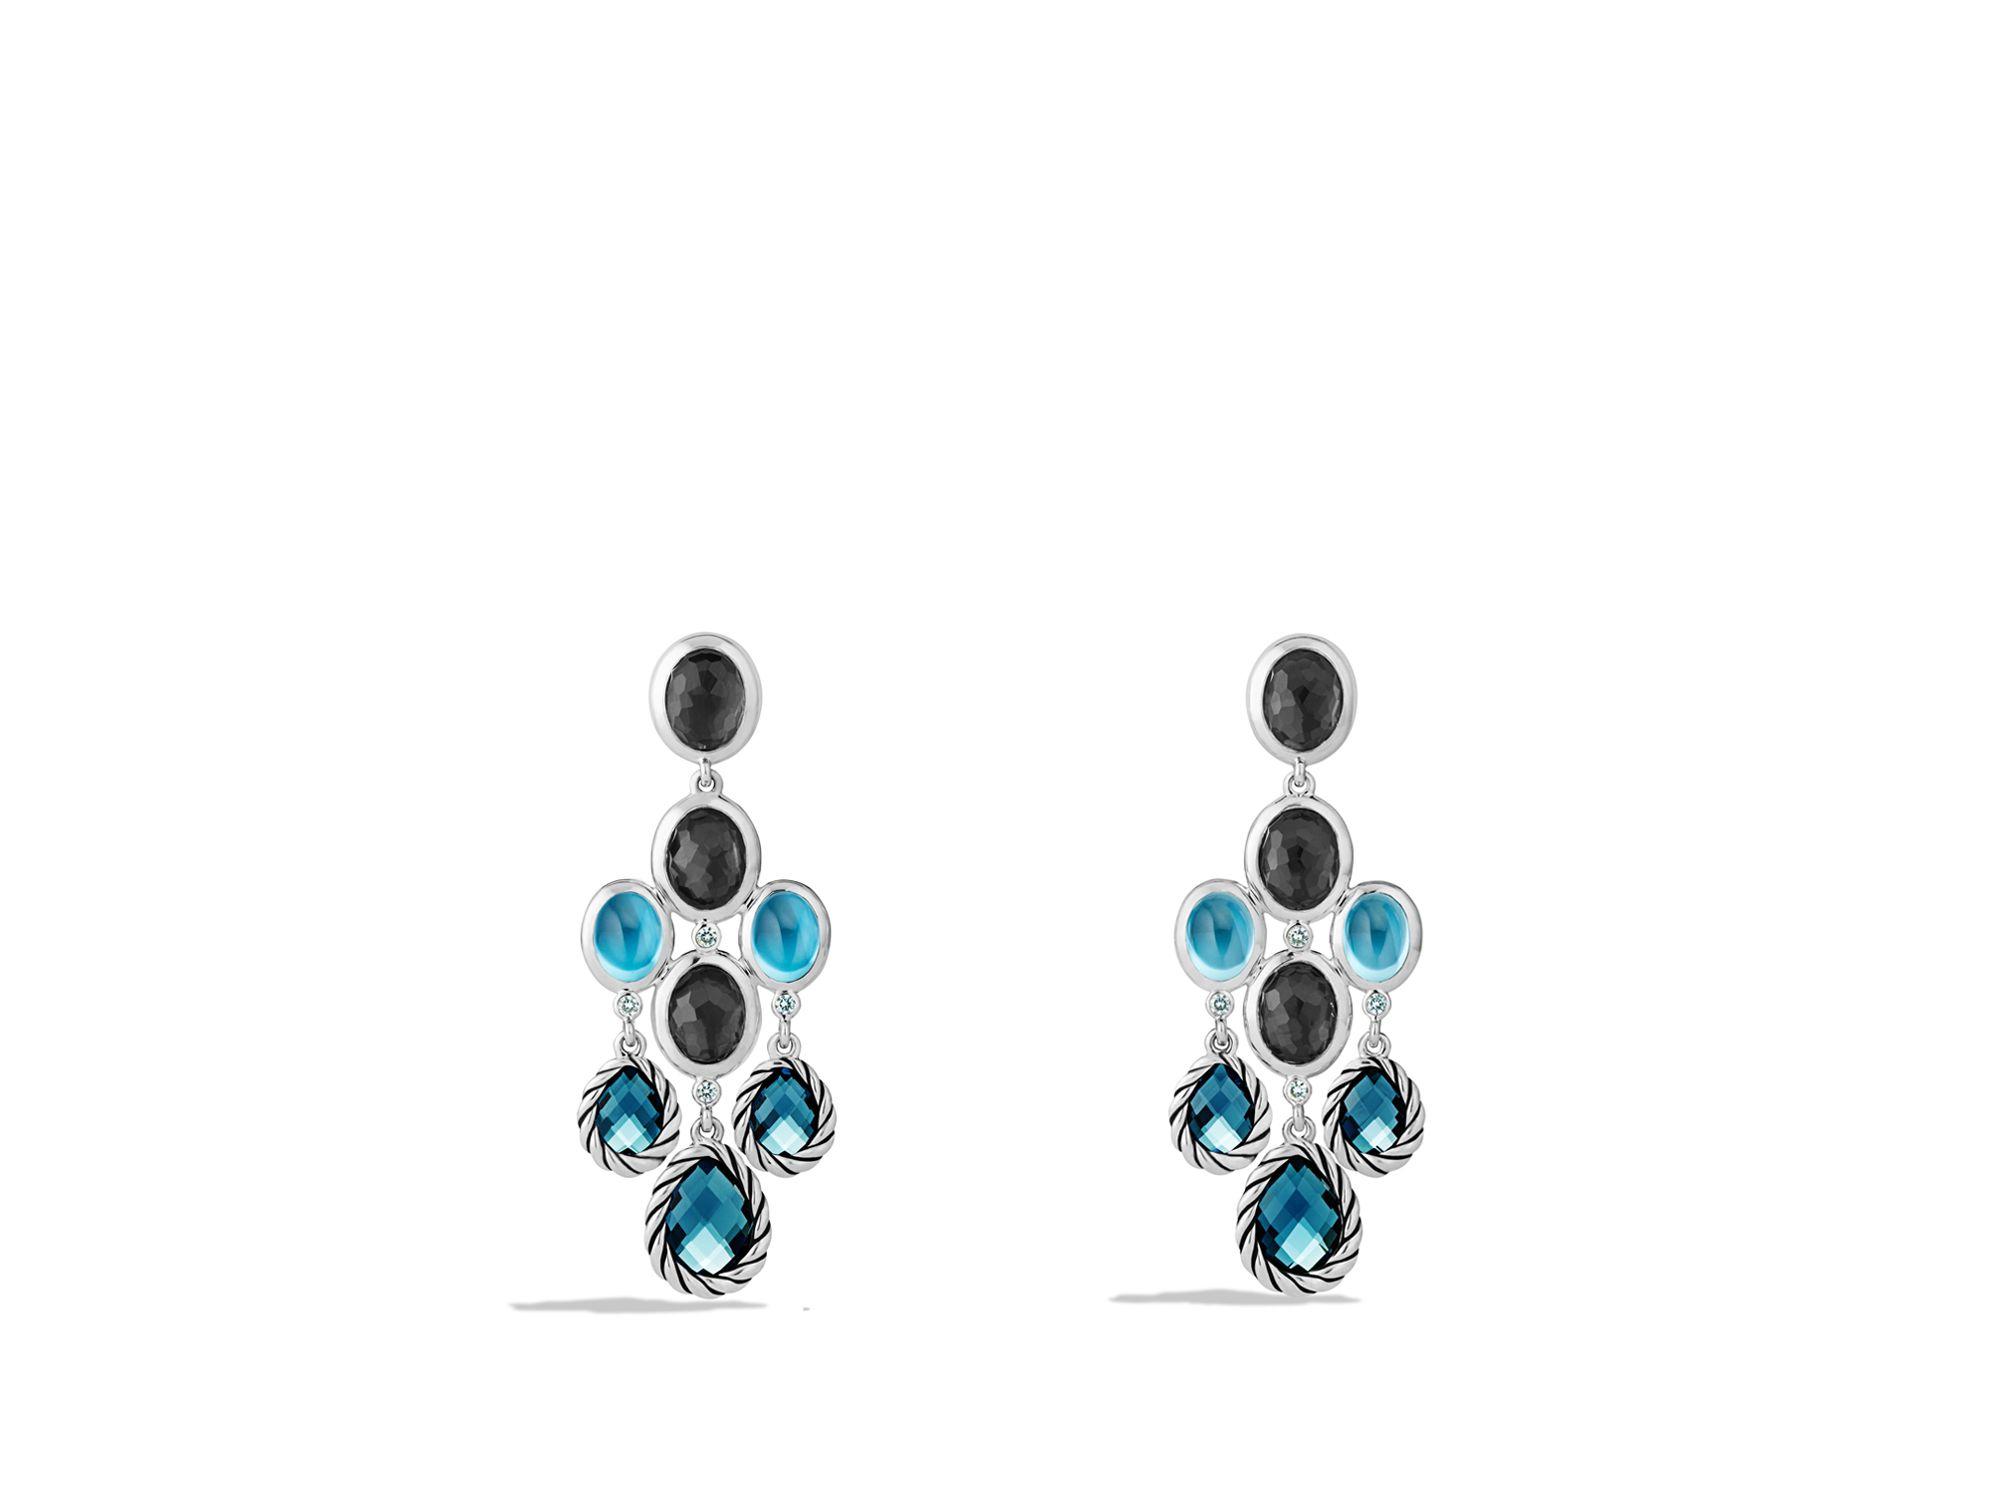 Lyst david yurman ultramarine chandelier earrings with blue topaz gallery aloadofball Image collections